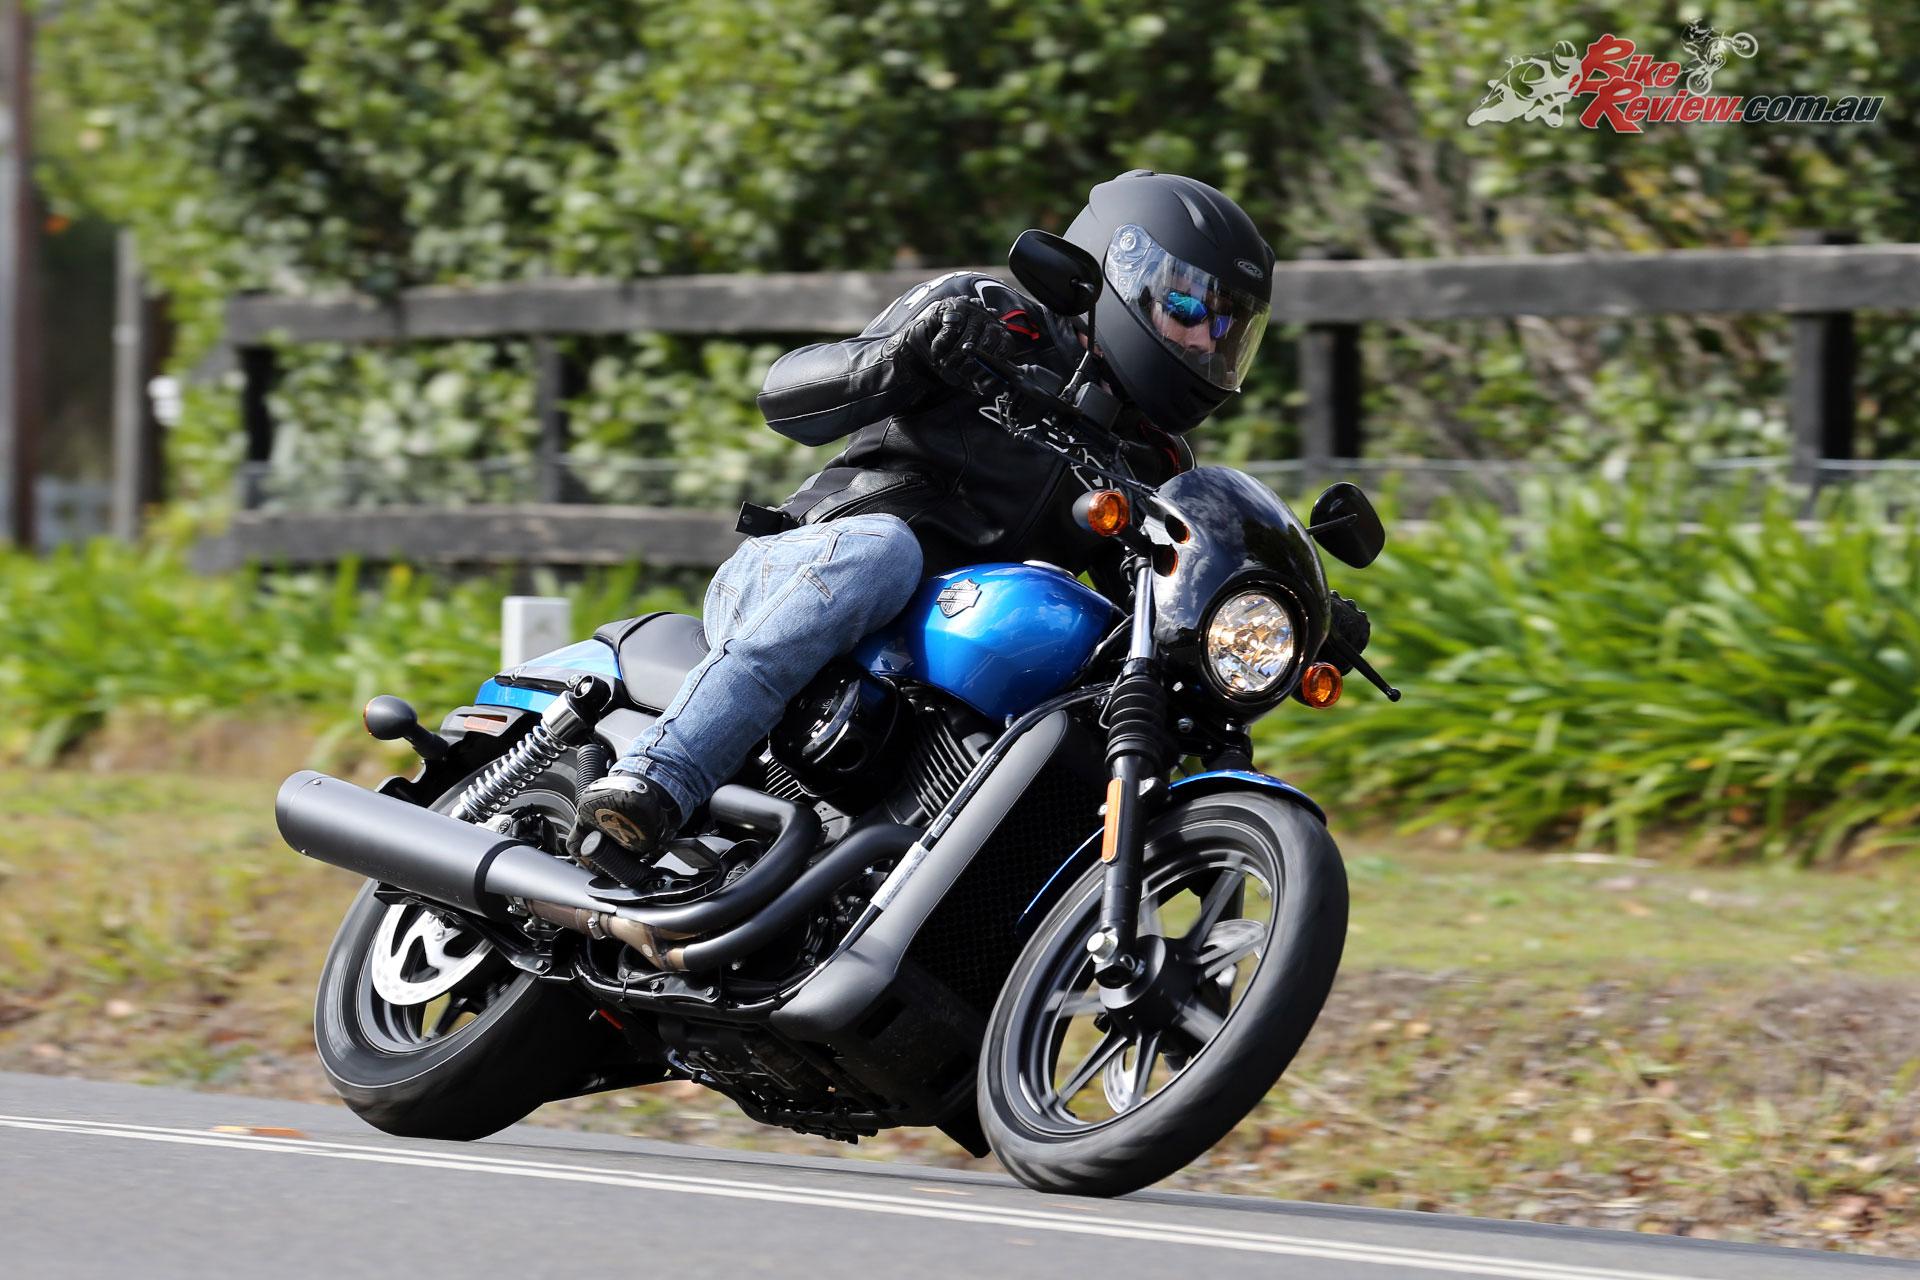 Harley-Davidson's Street 500 LAMS machine